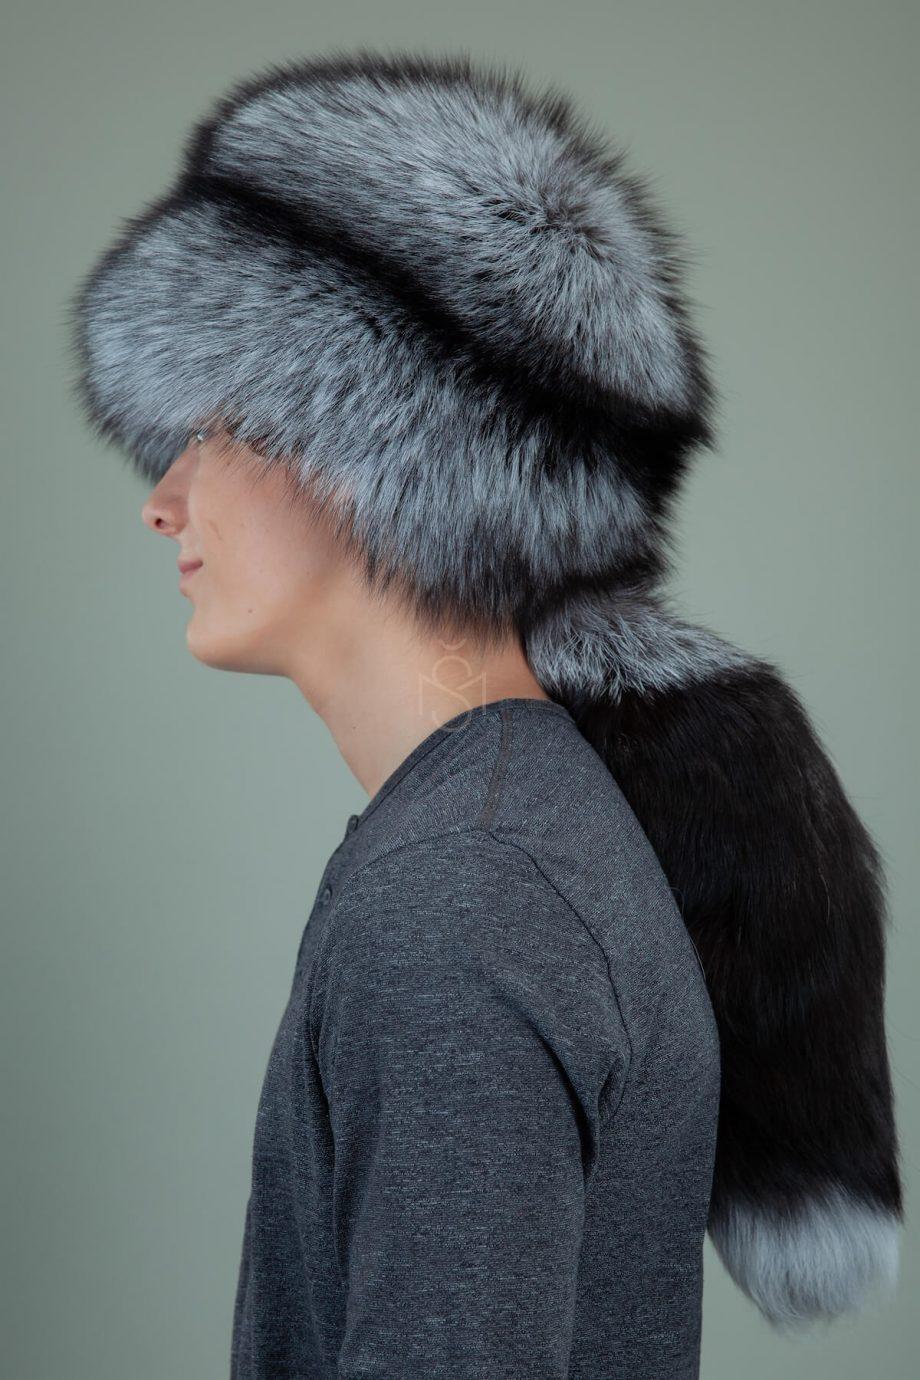 apvali juodsidabres kailio kepure su prisegama uodega vyrams